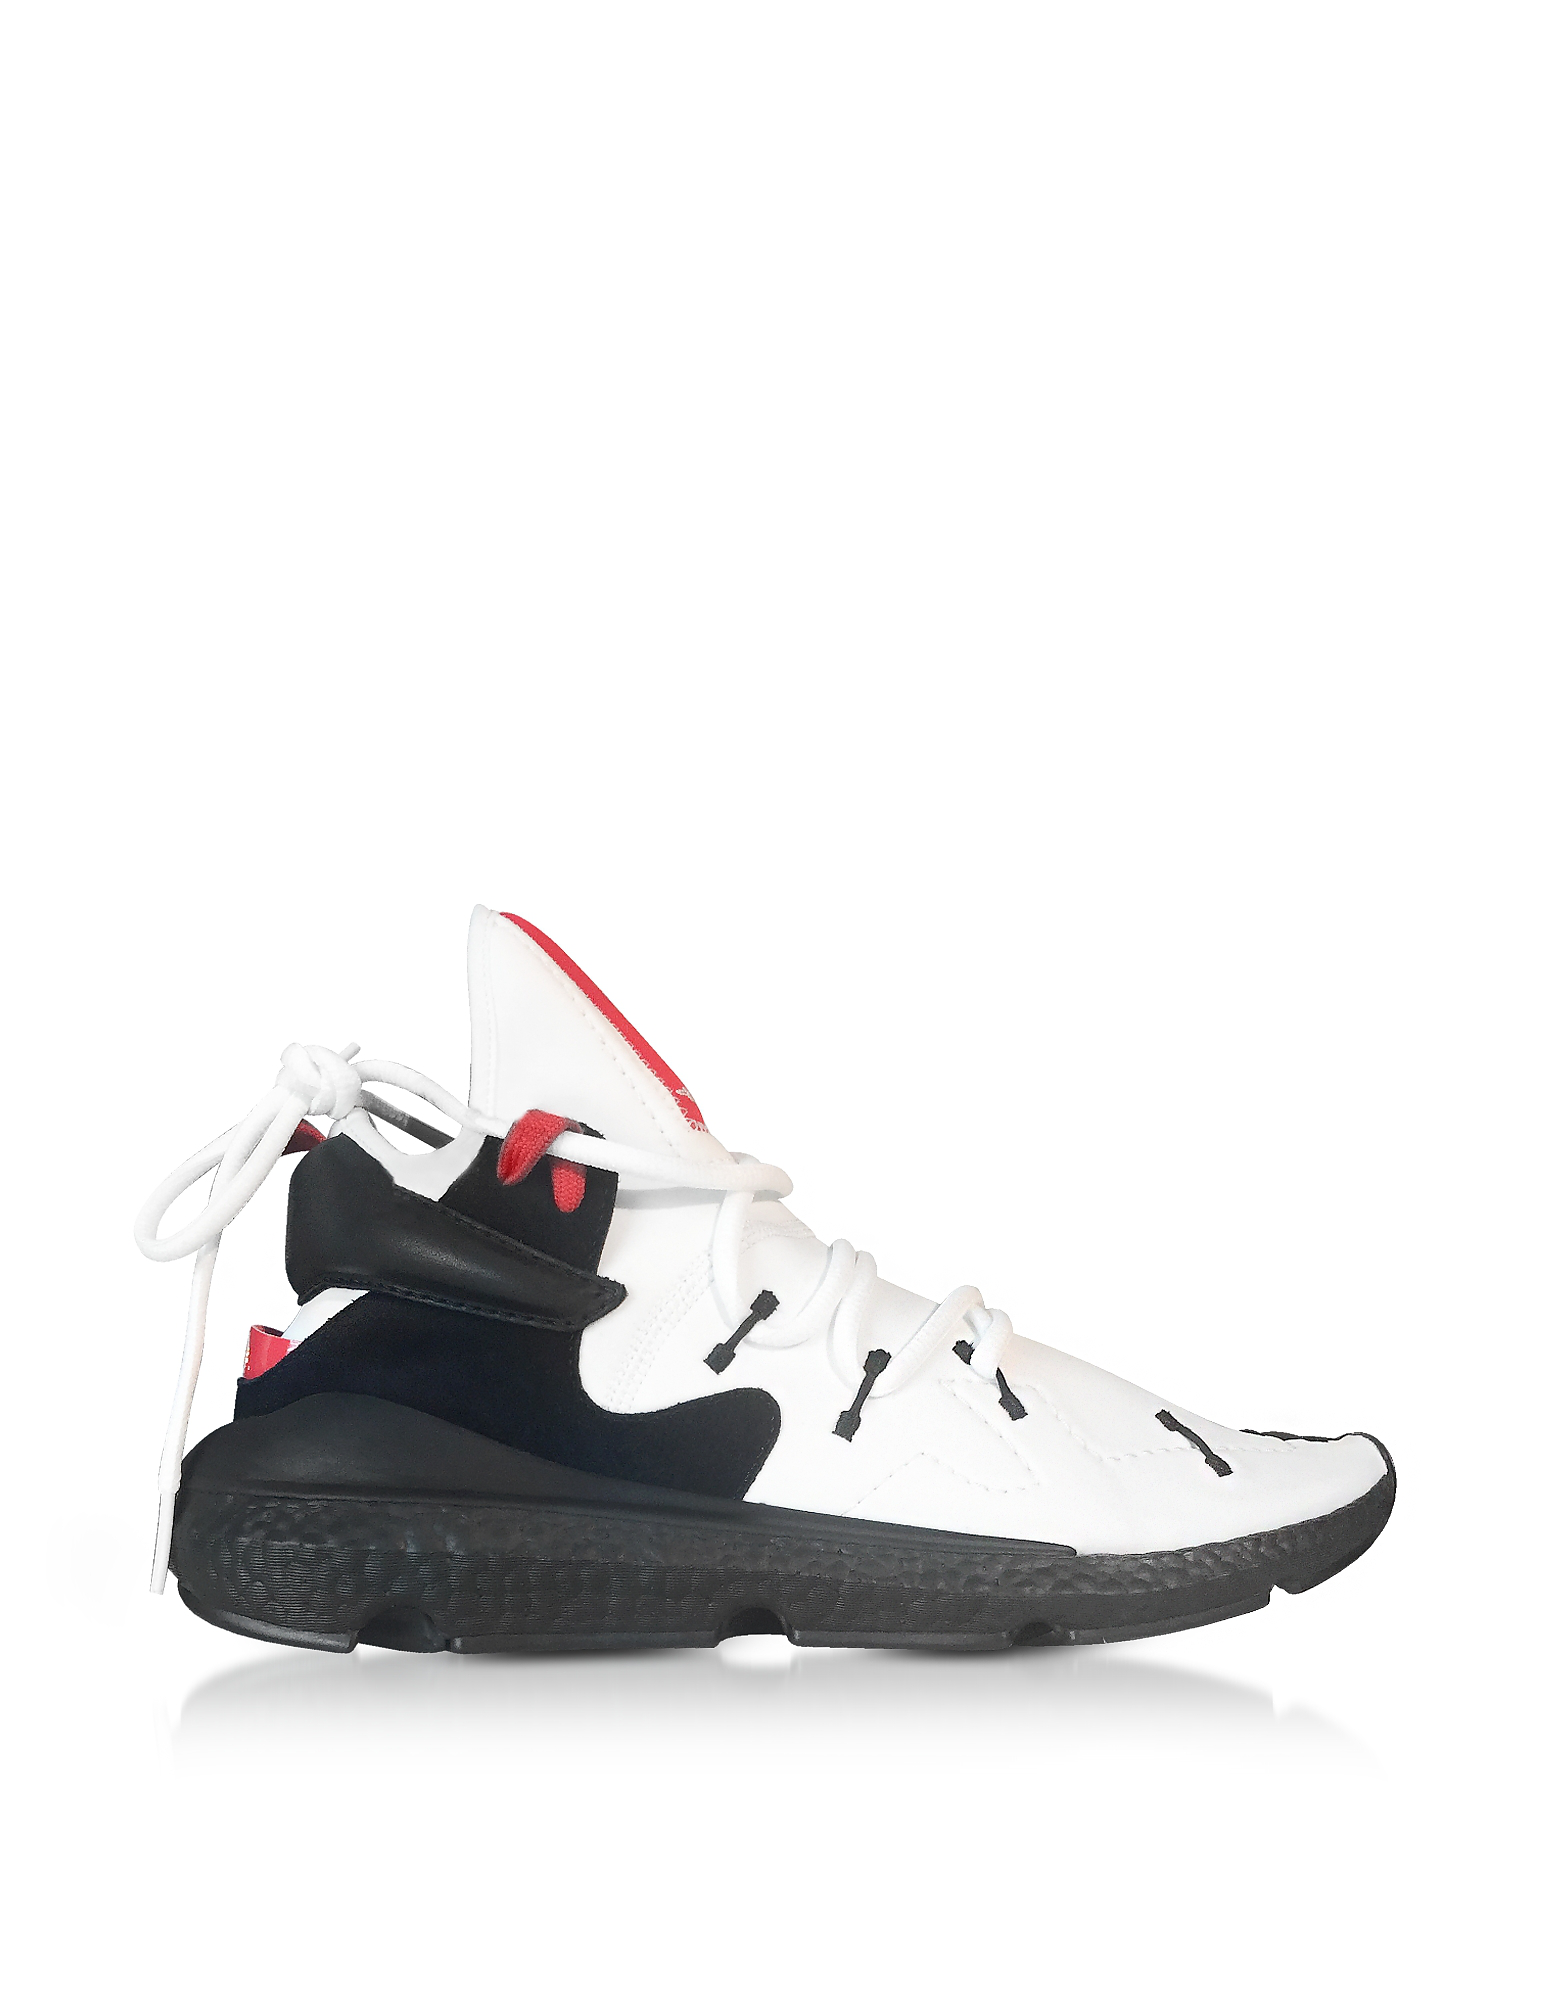 sports shoes 15375 7dd75 Y-3 Kusari Ii Black, White And Red Neoprene Sneaker